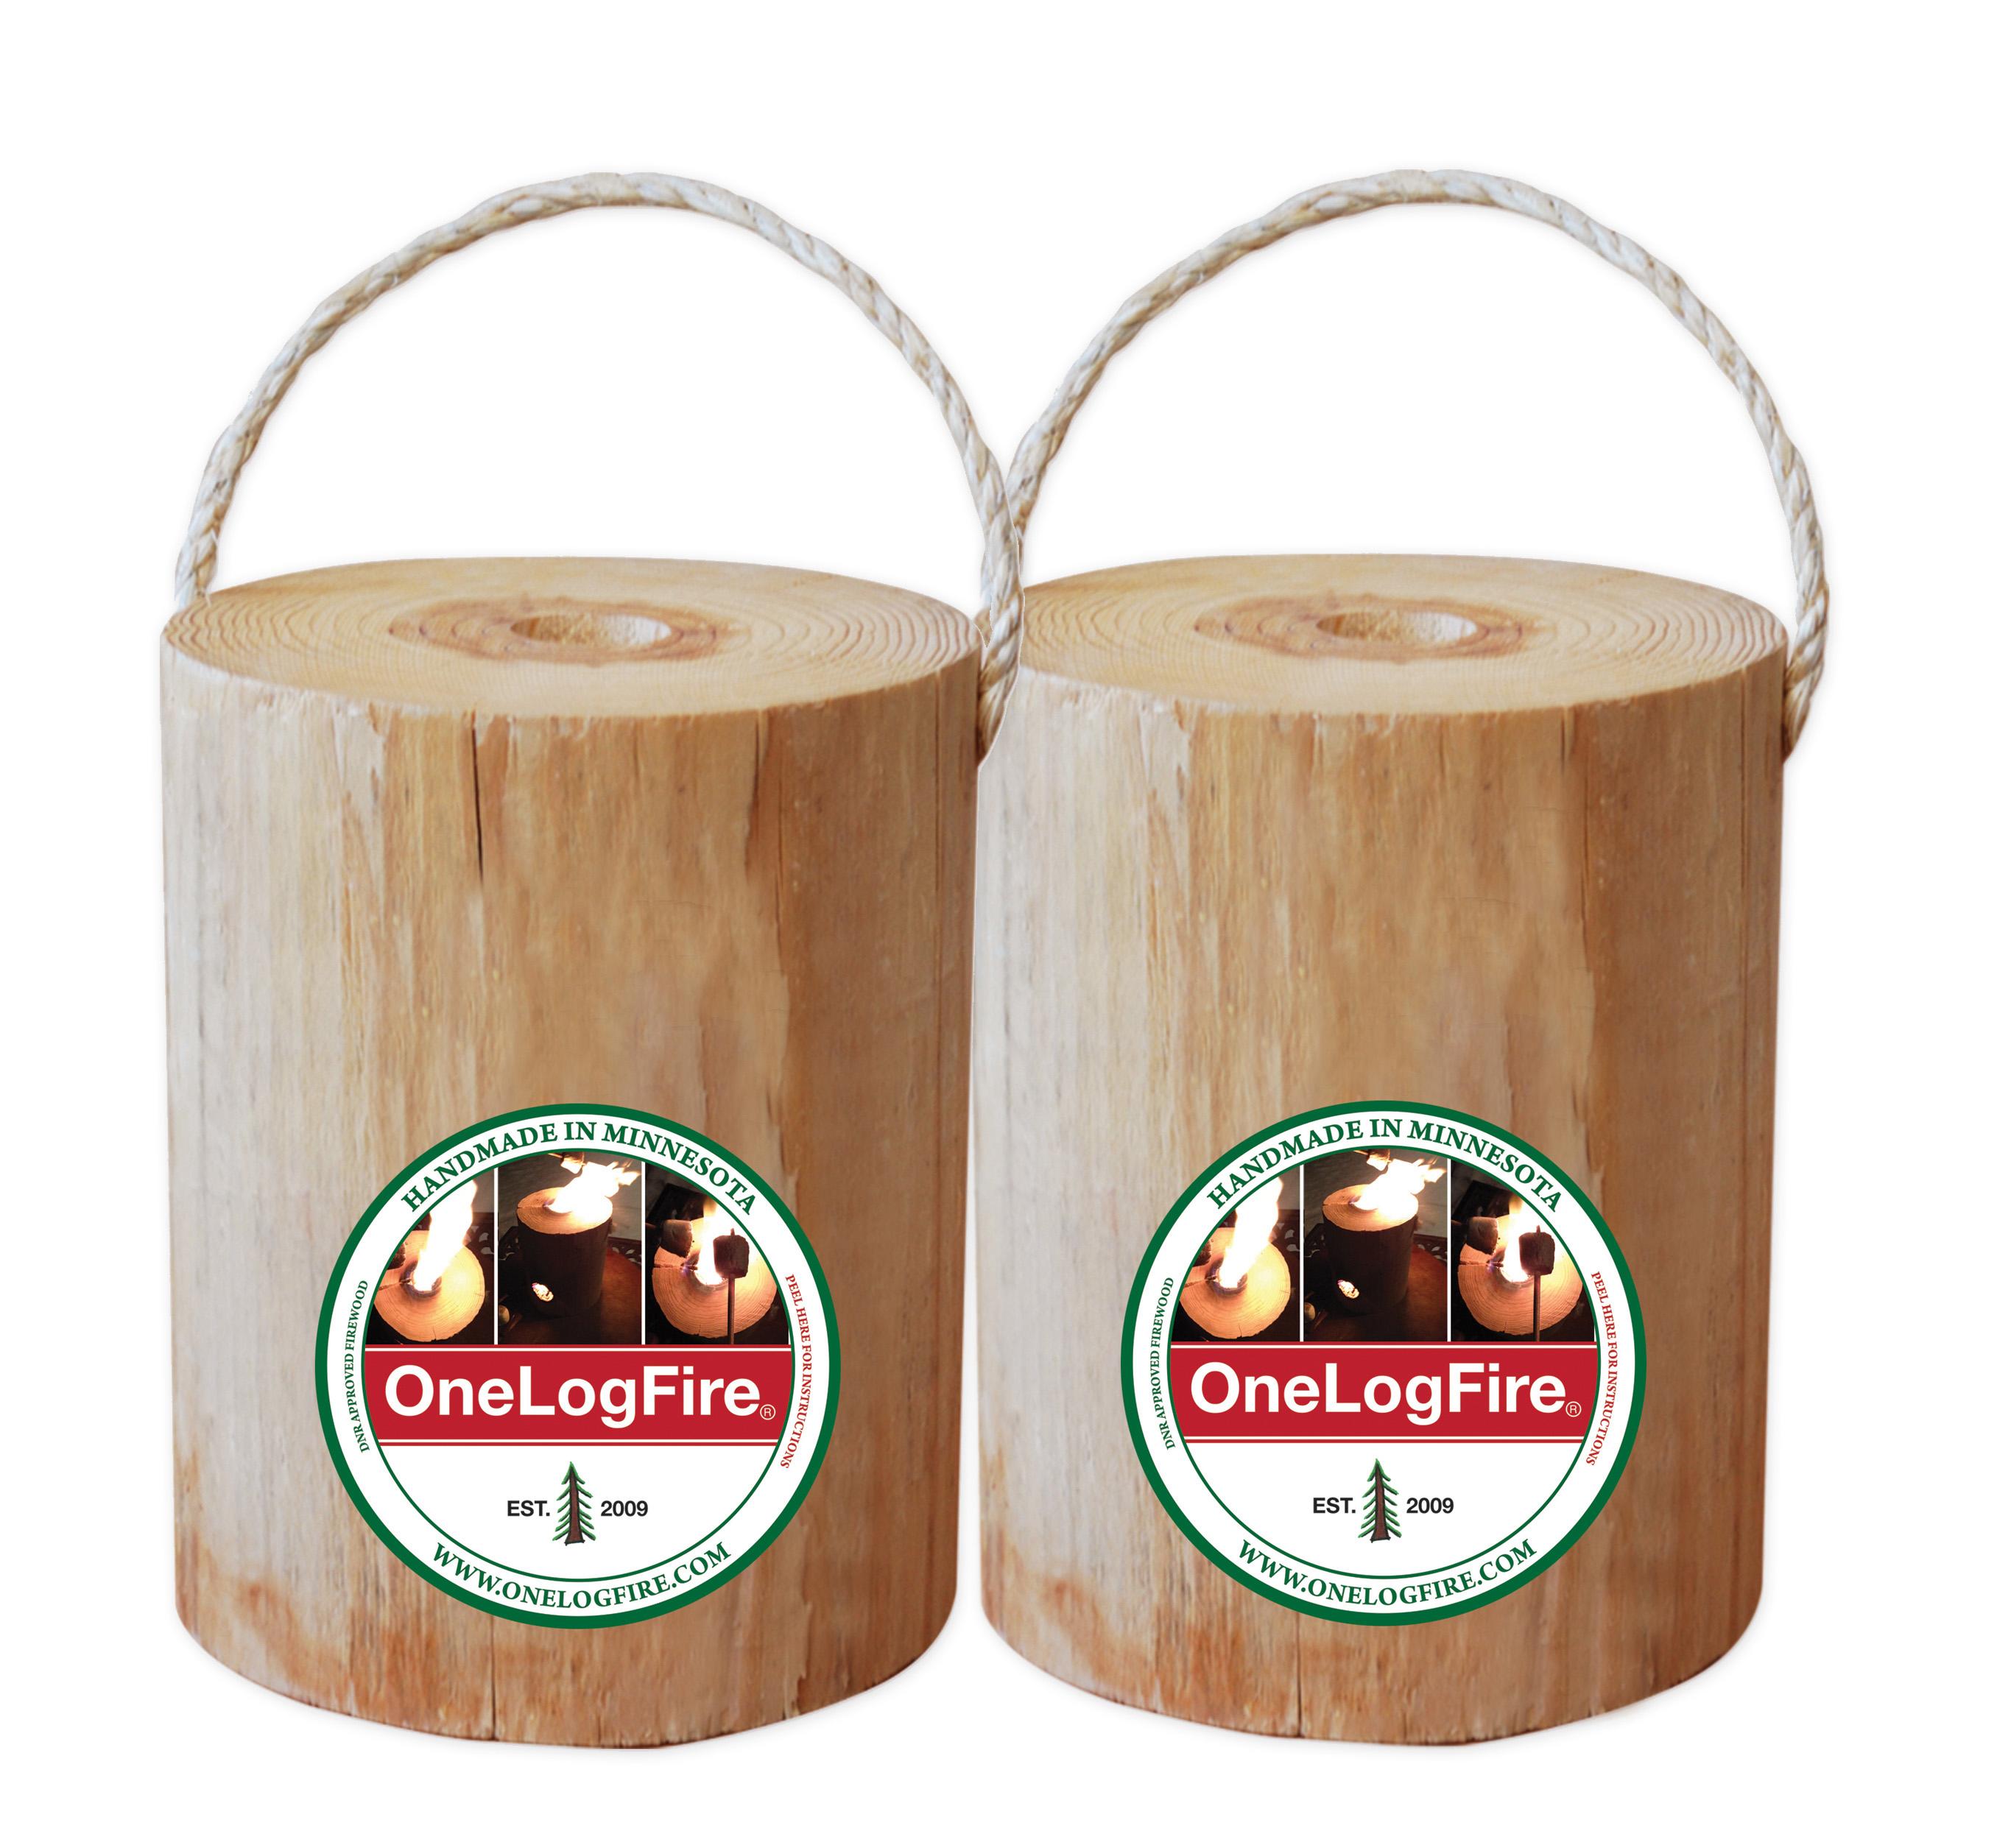 ONE LOG FIRE REGULAR 2 PACK